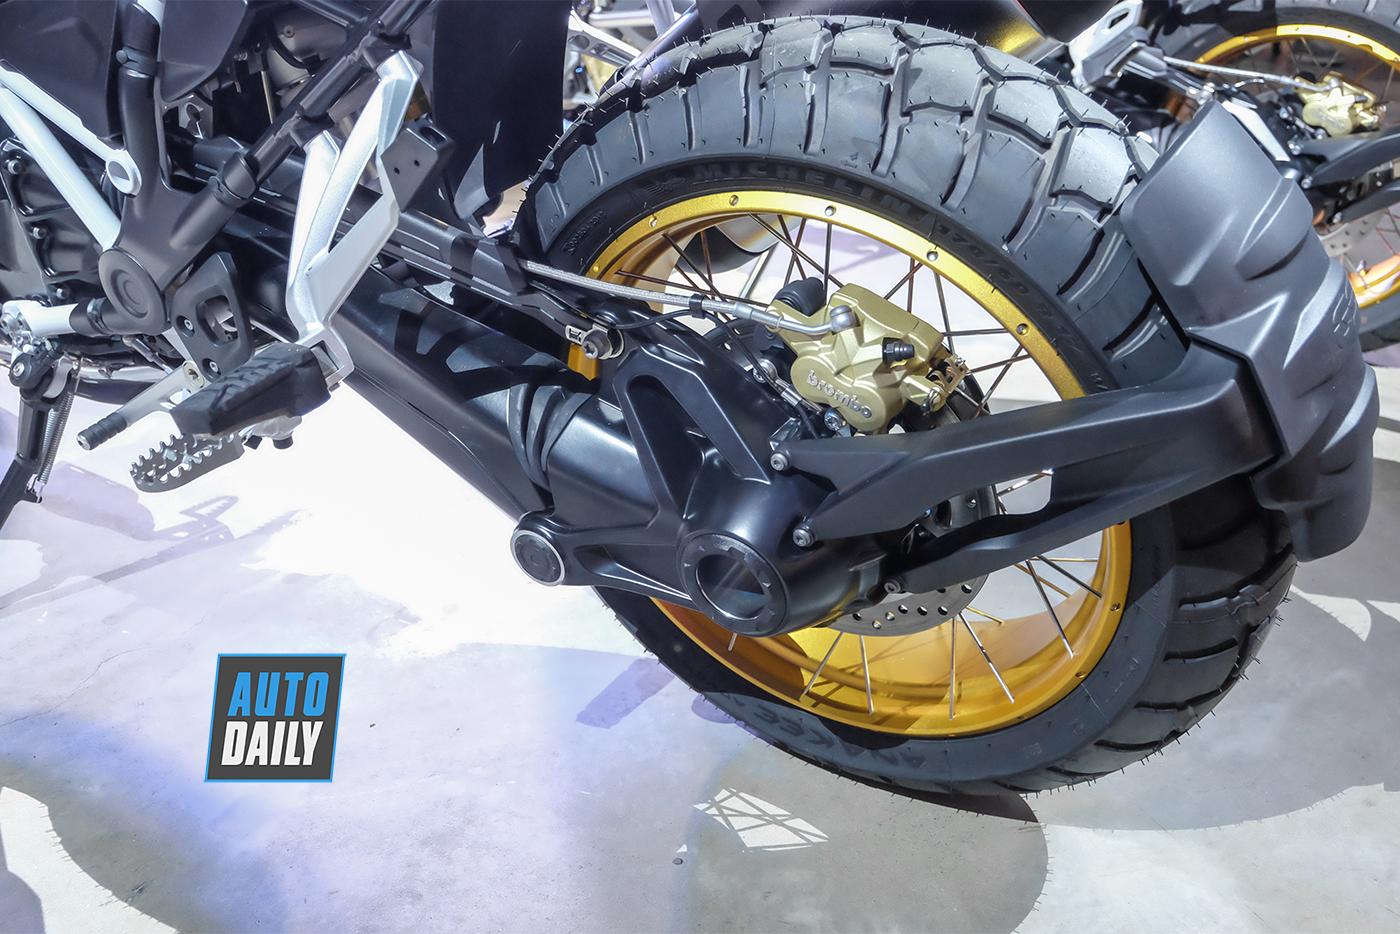 bmw-motorrad-r-1250-gs-2019-17.jpg